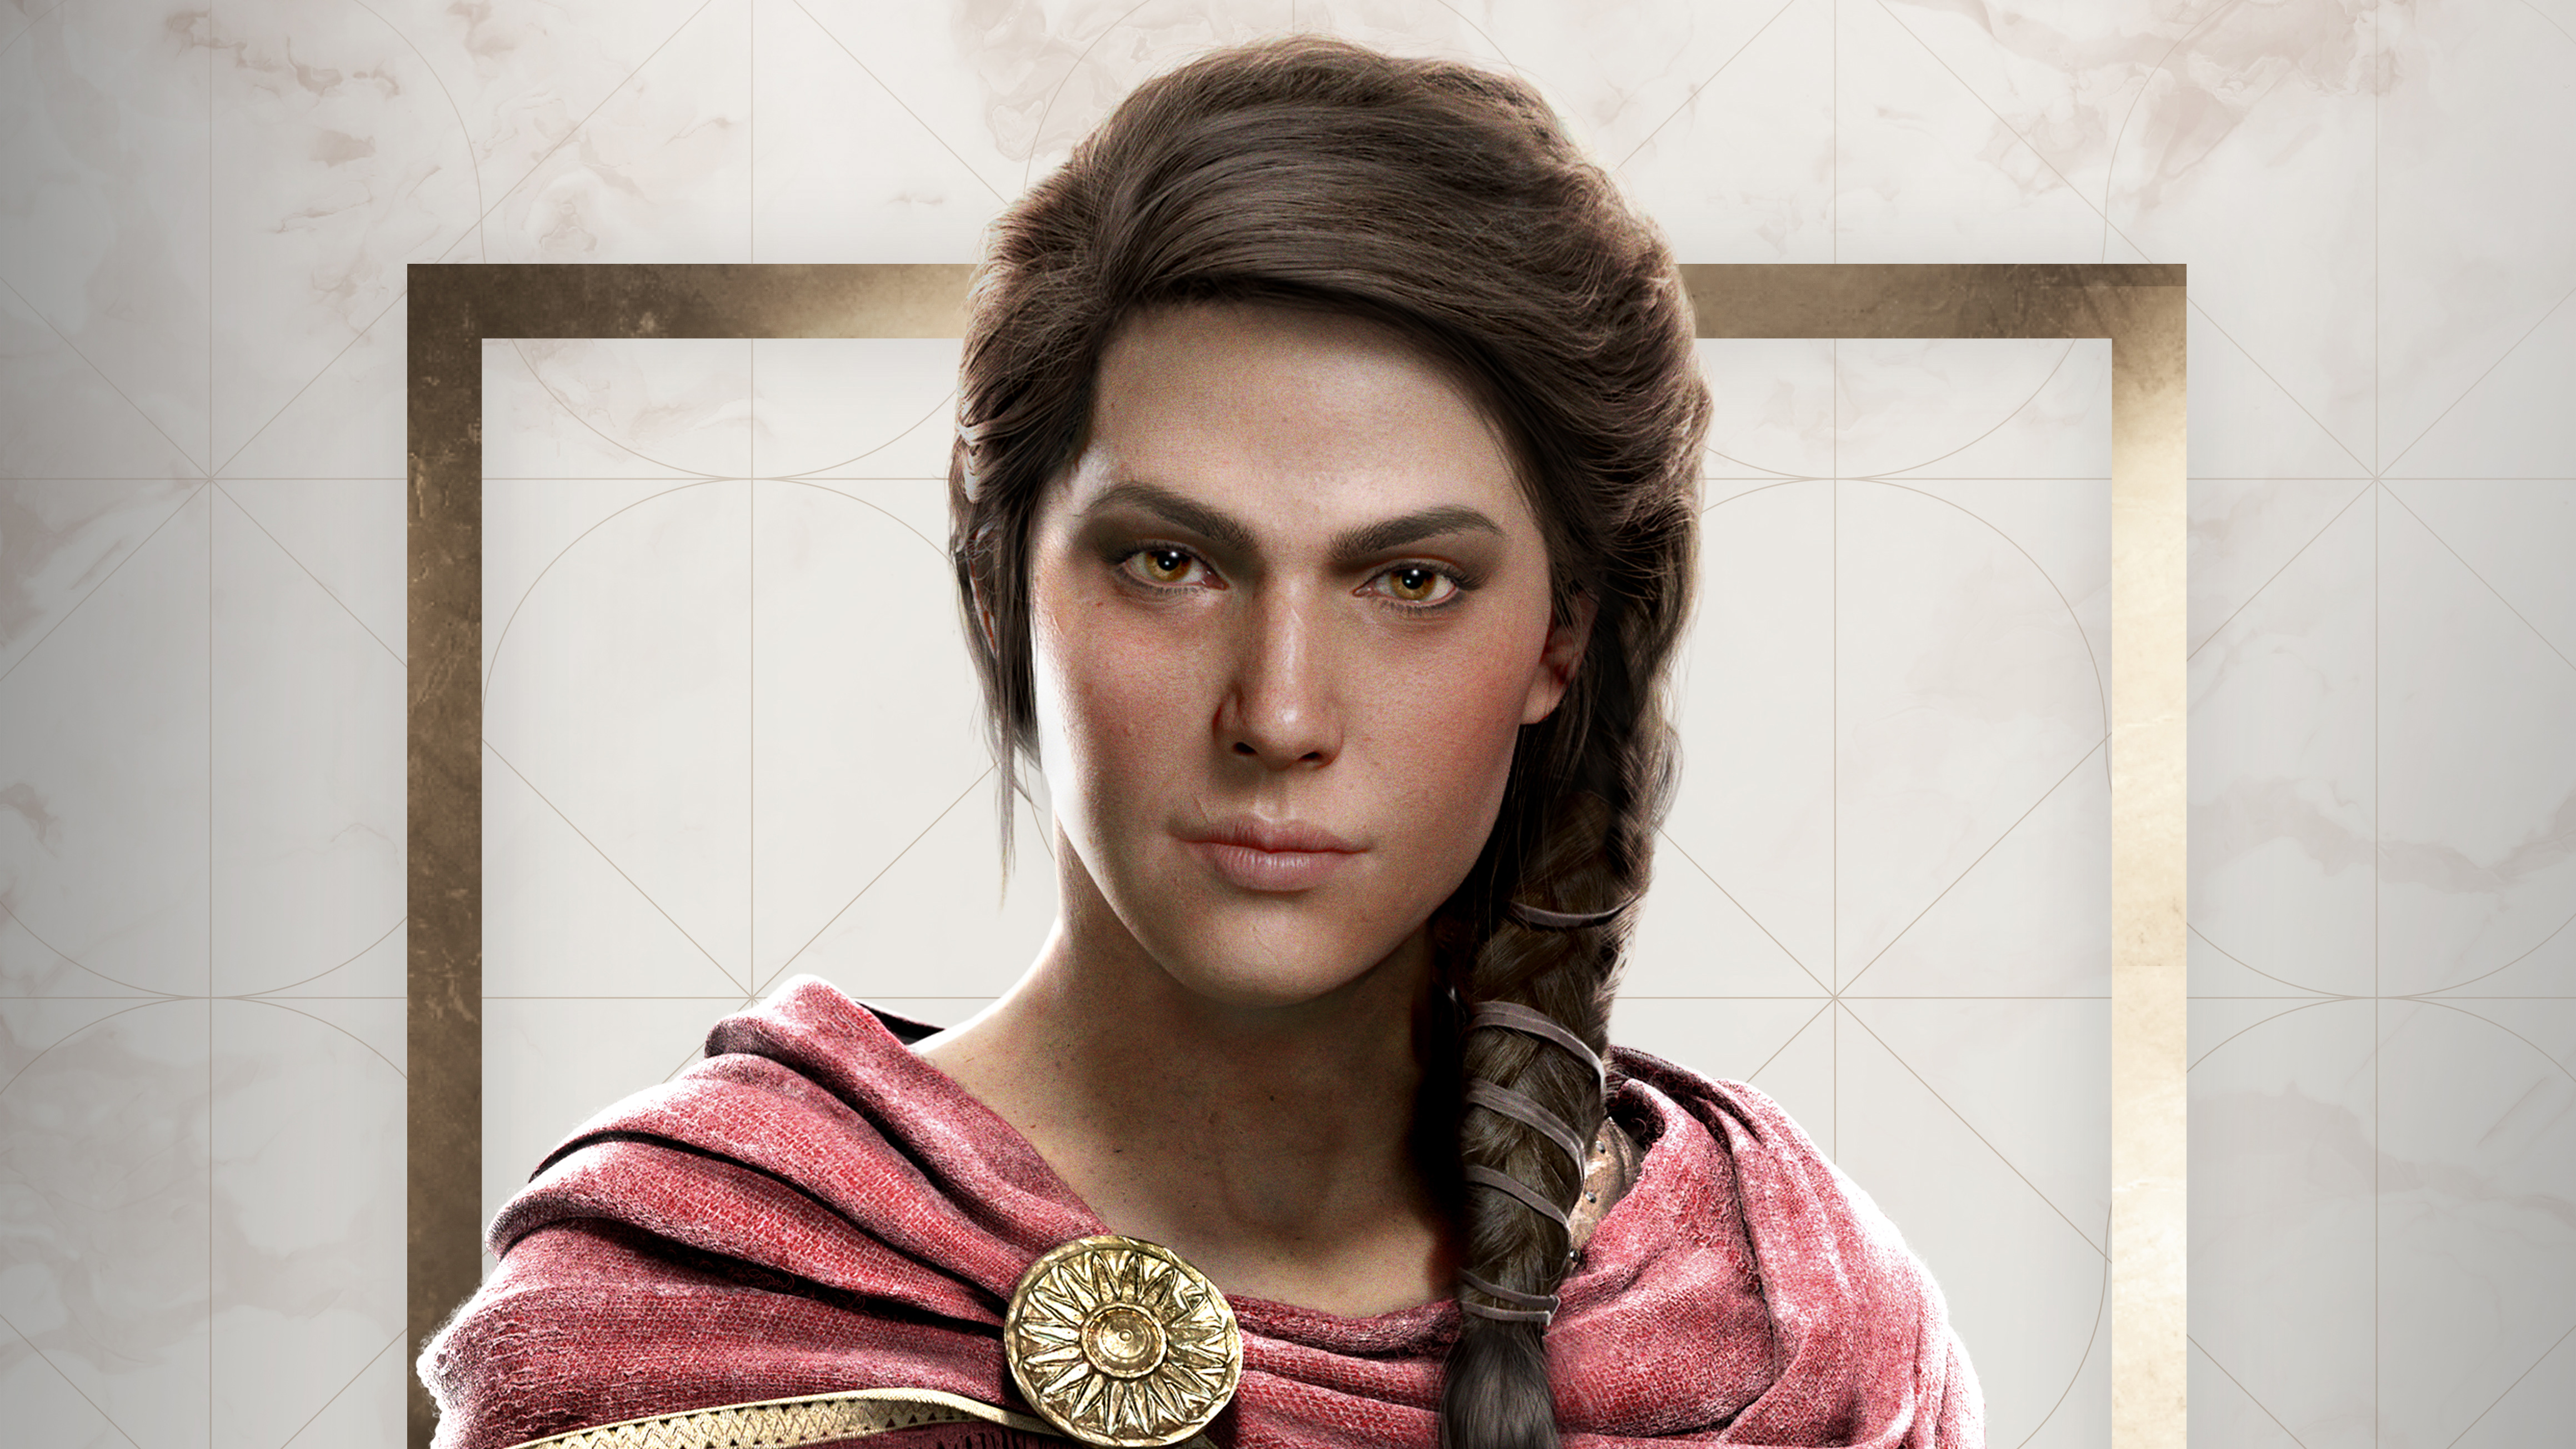 Kassandra Assassin S Creed Odyssey 4k Wallpaper Best Wallpapers